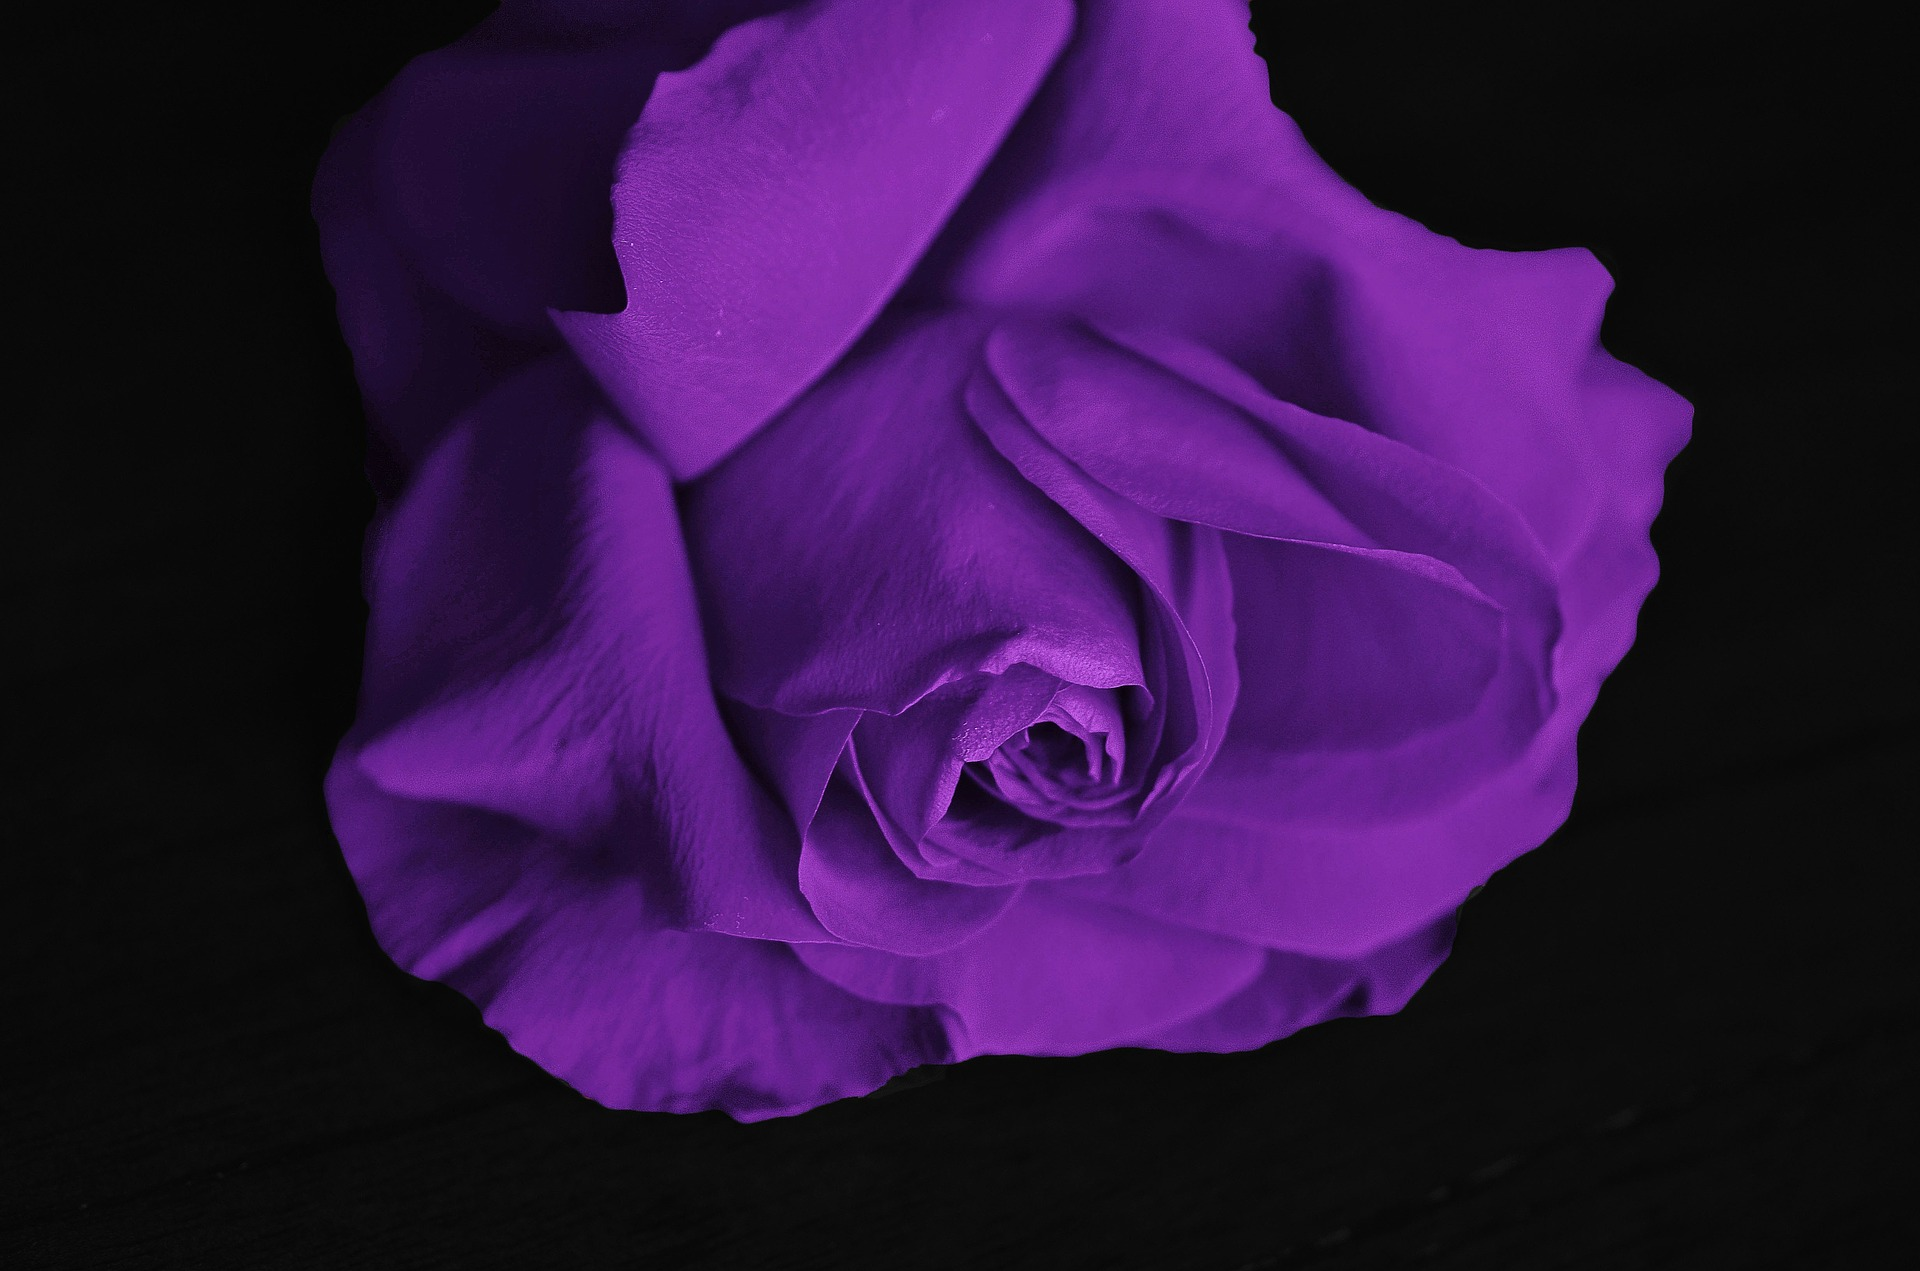 roses-292595_1920